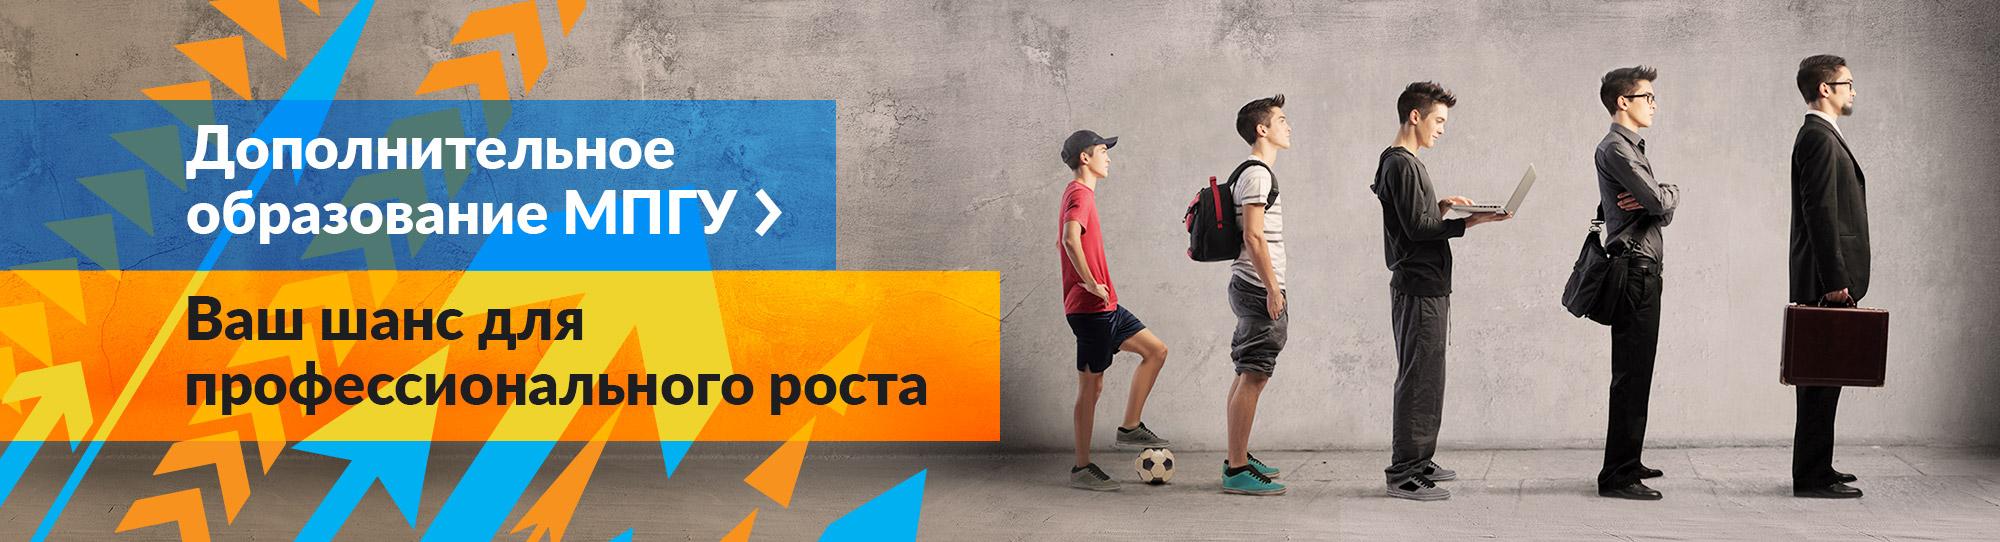 mpgu-site-big-banner-DopObrazovanie-5-1